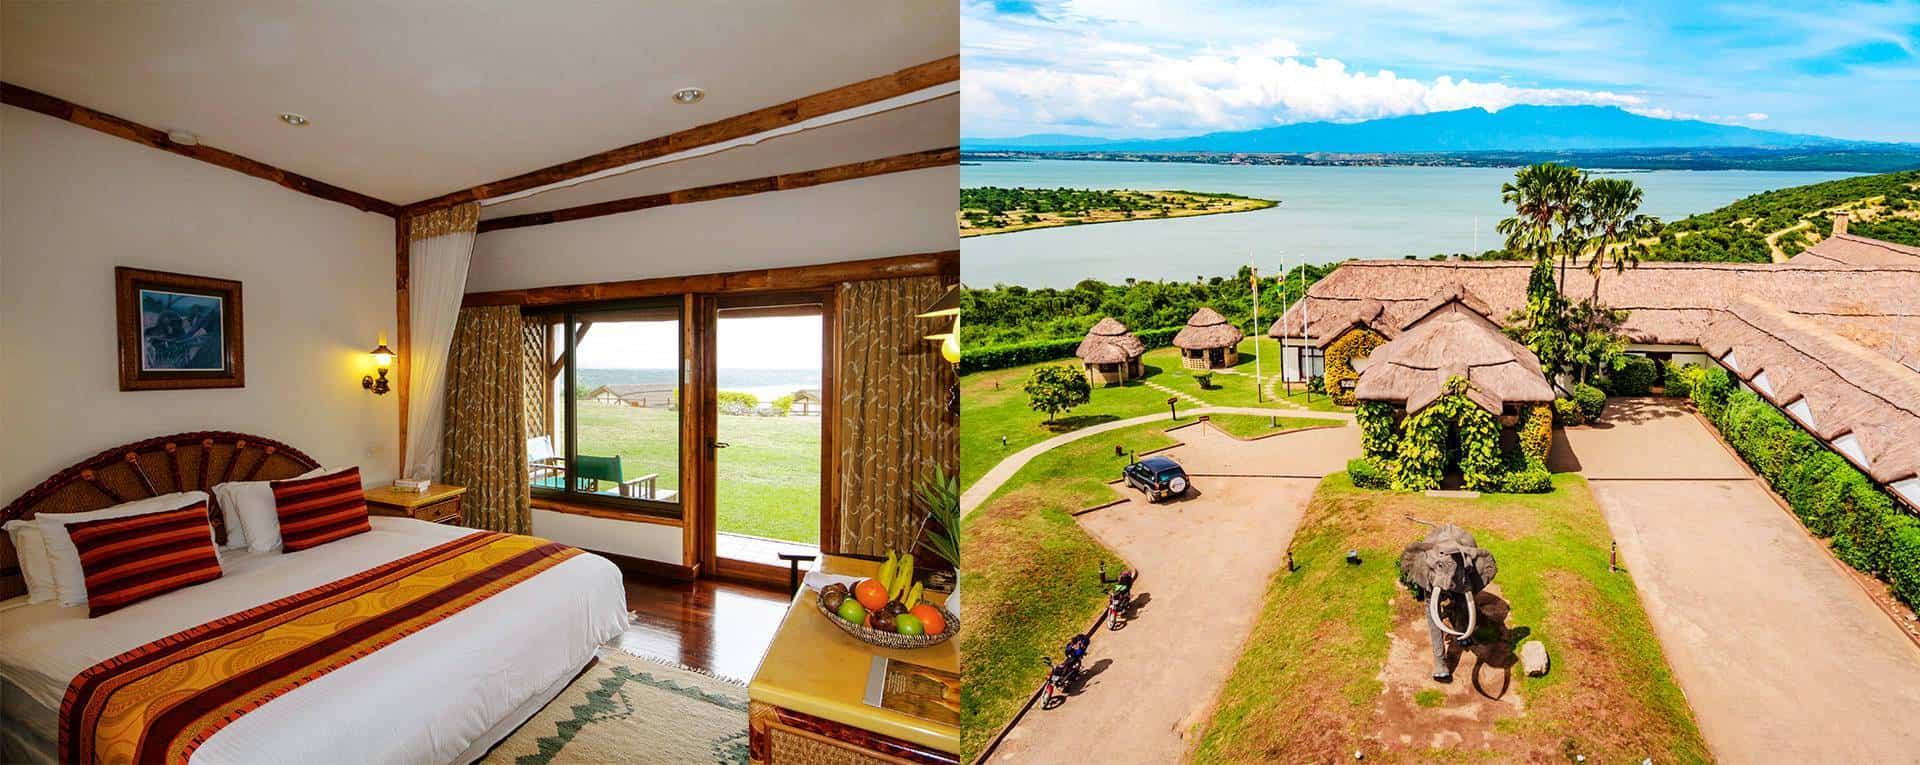 Mweya Safari Lodge Queen Elizabeth